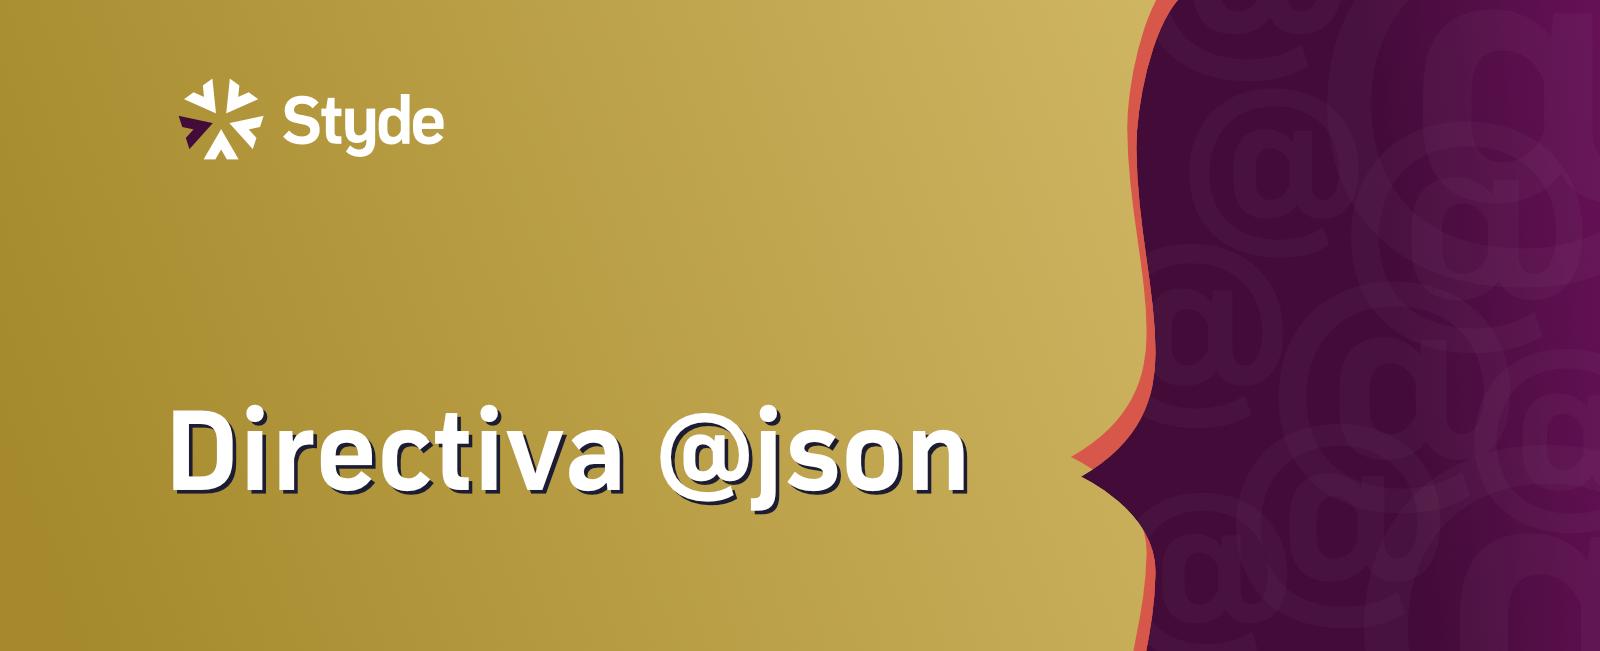 Directiva json